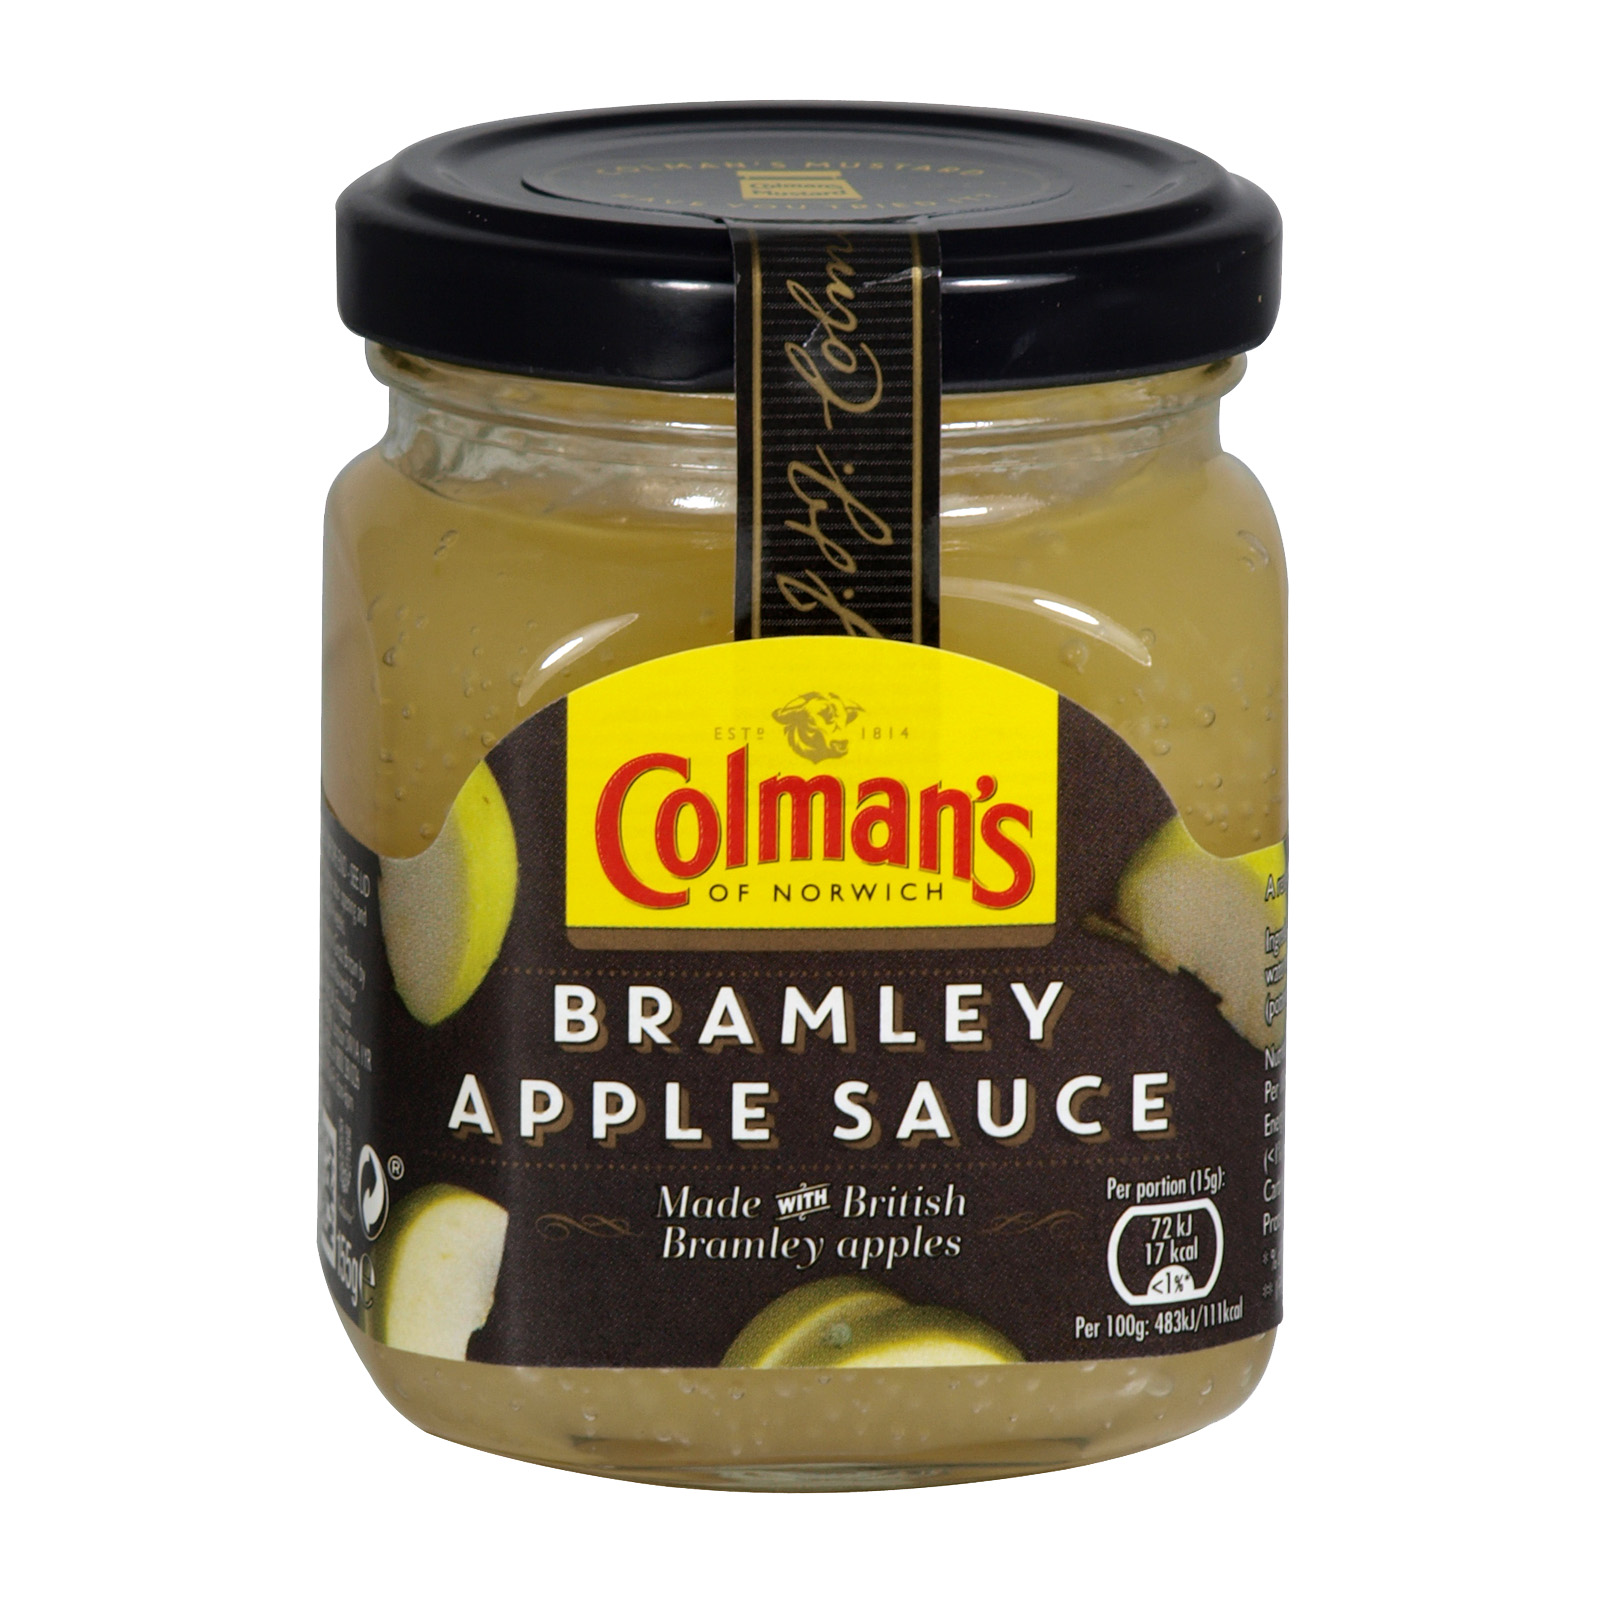 COLMANS BRAMLEY APPLE SAUCE 155G JAR